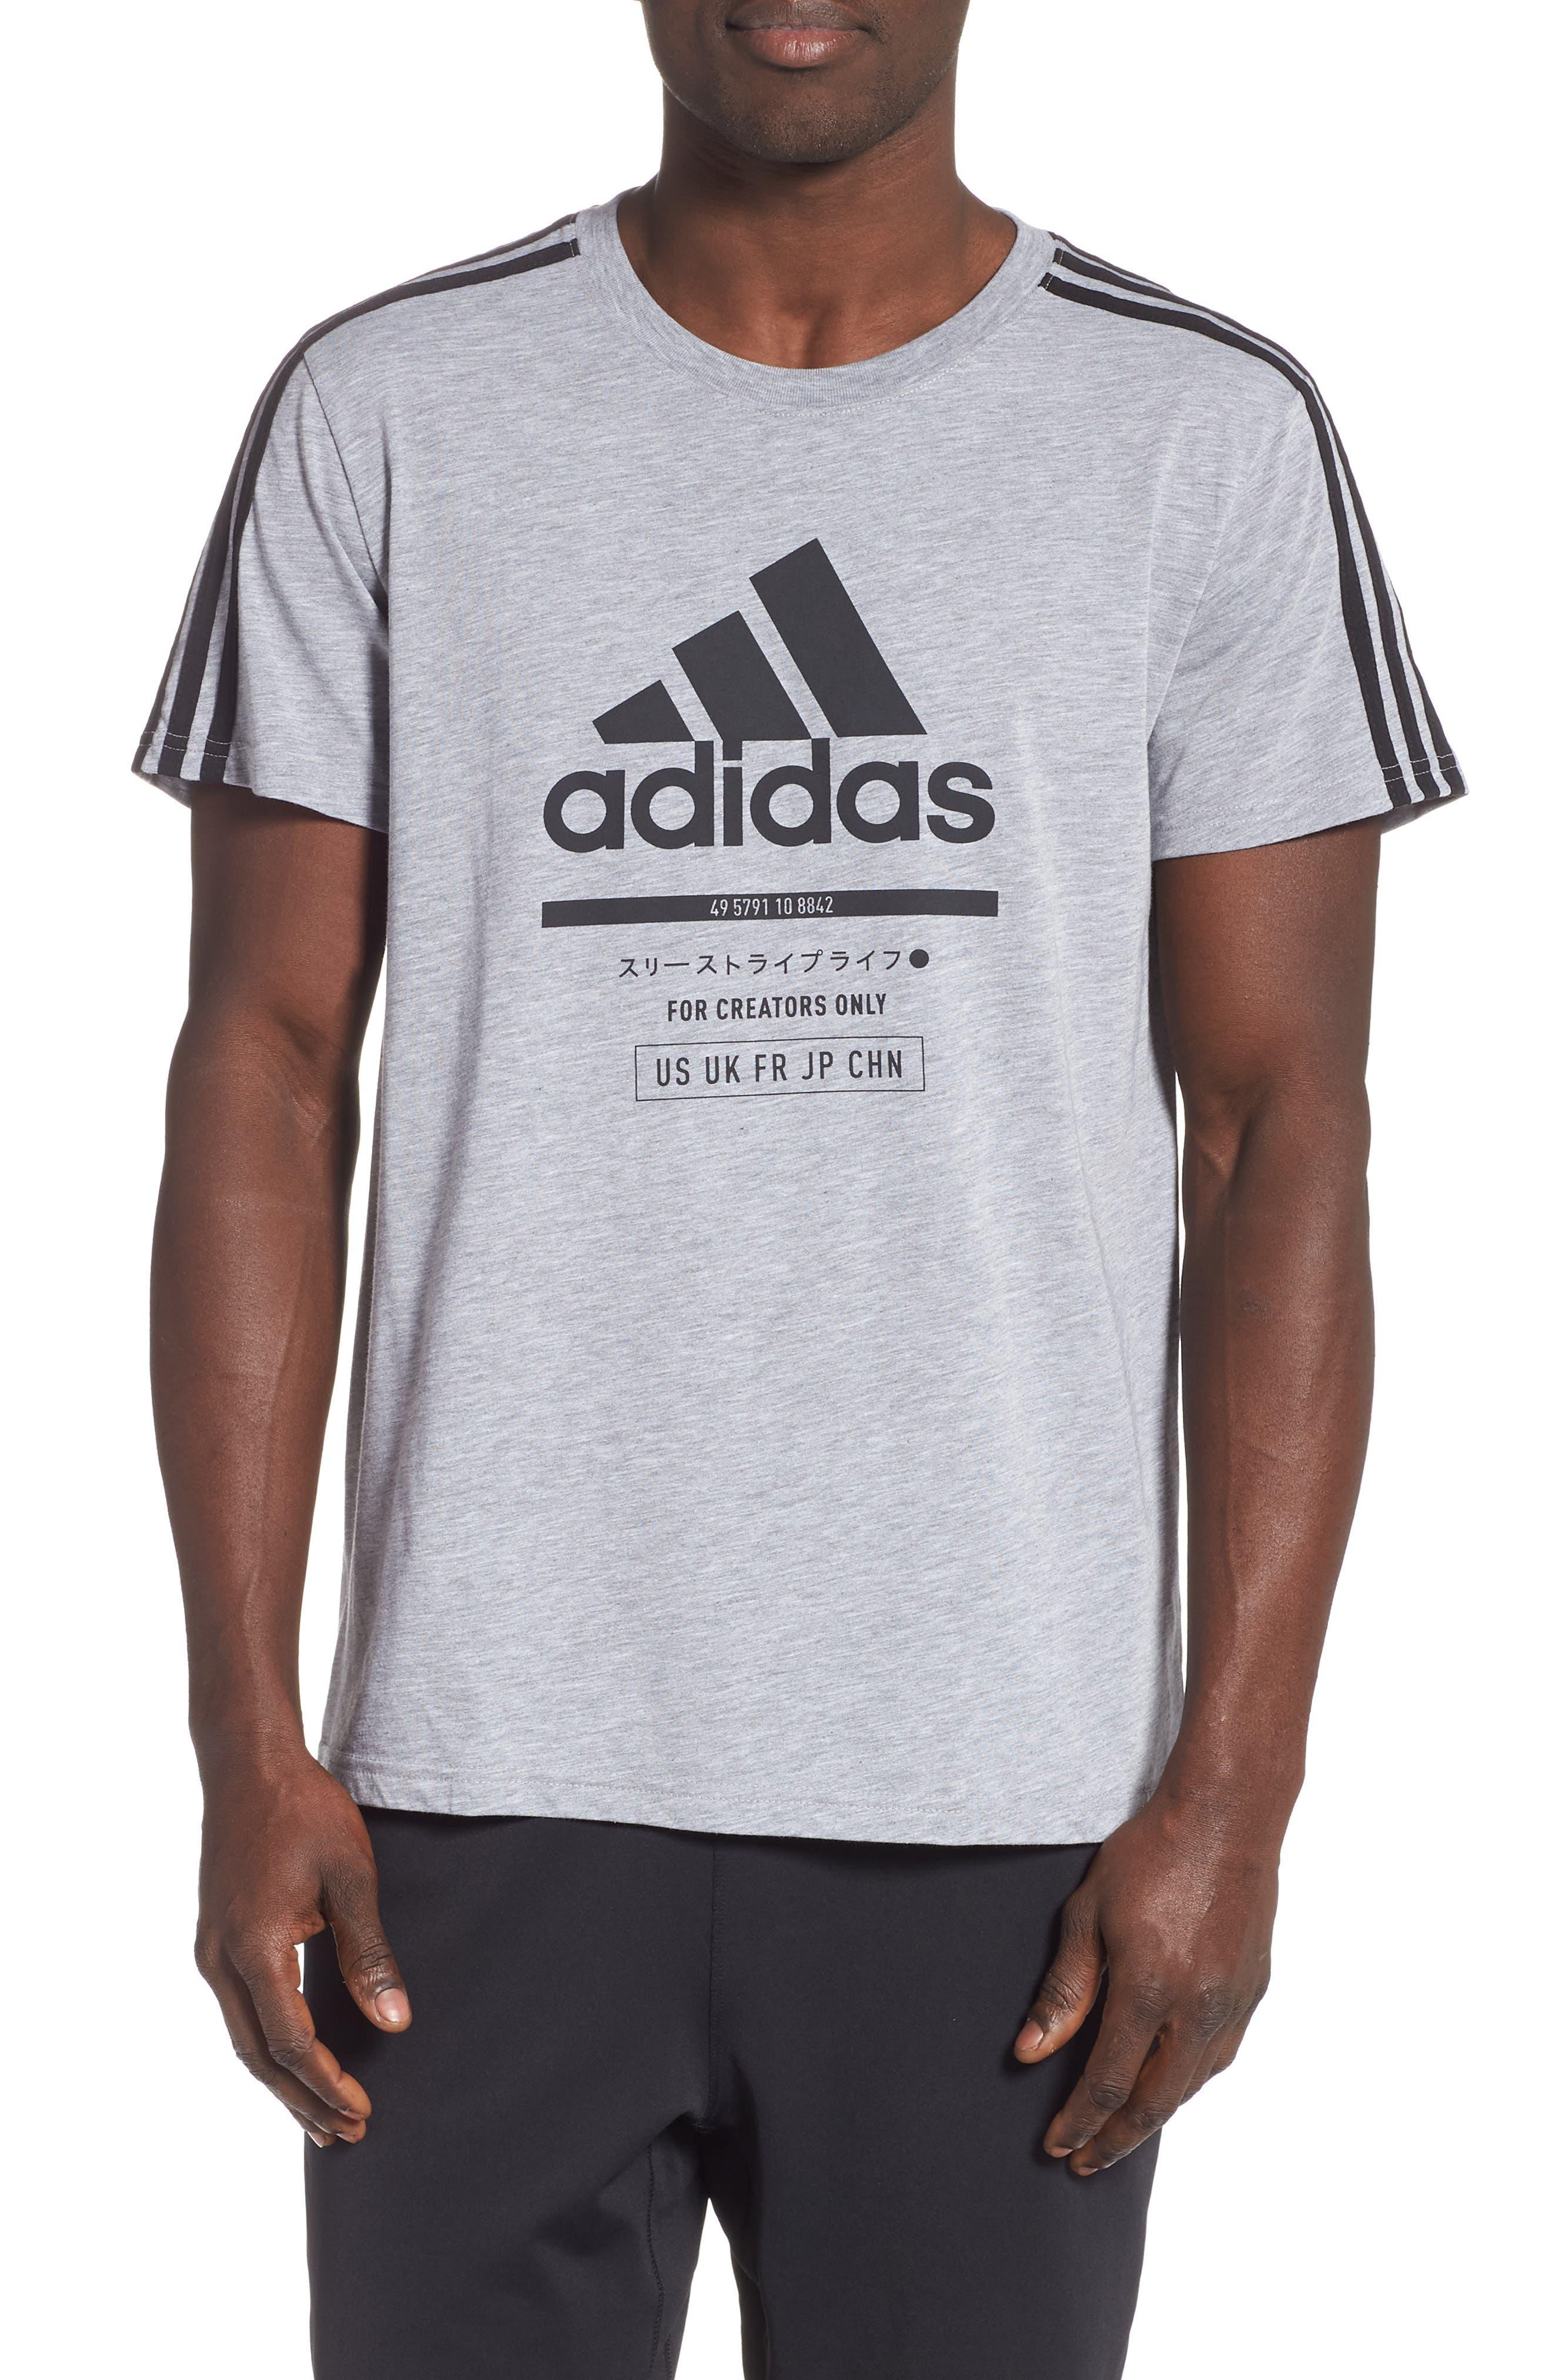 Adidas Classic International T-Shirt, Grey